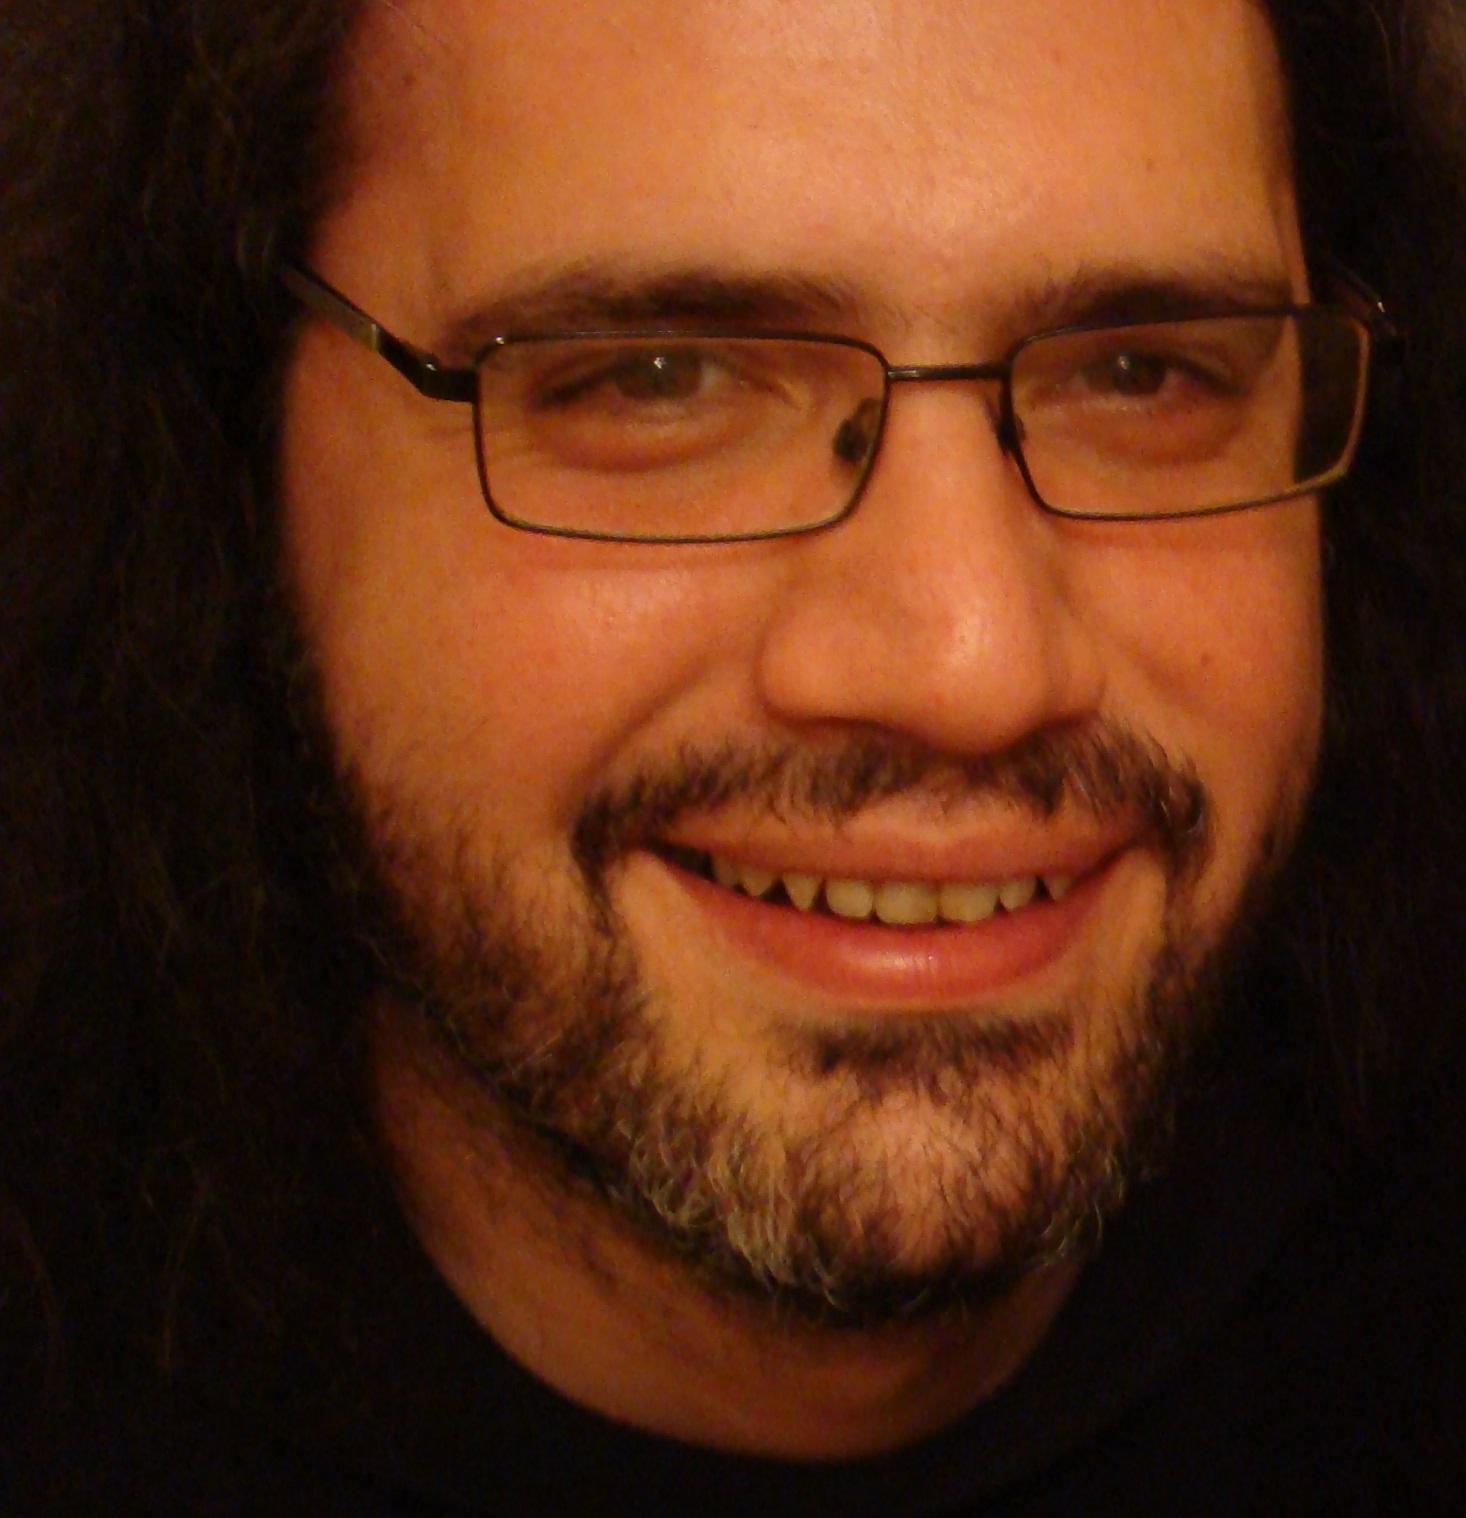 Professor Panos Athanasopoulos